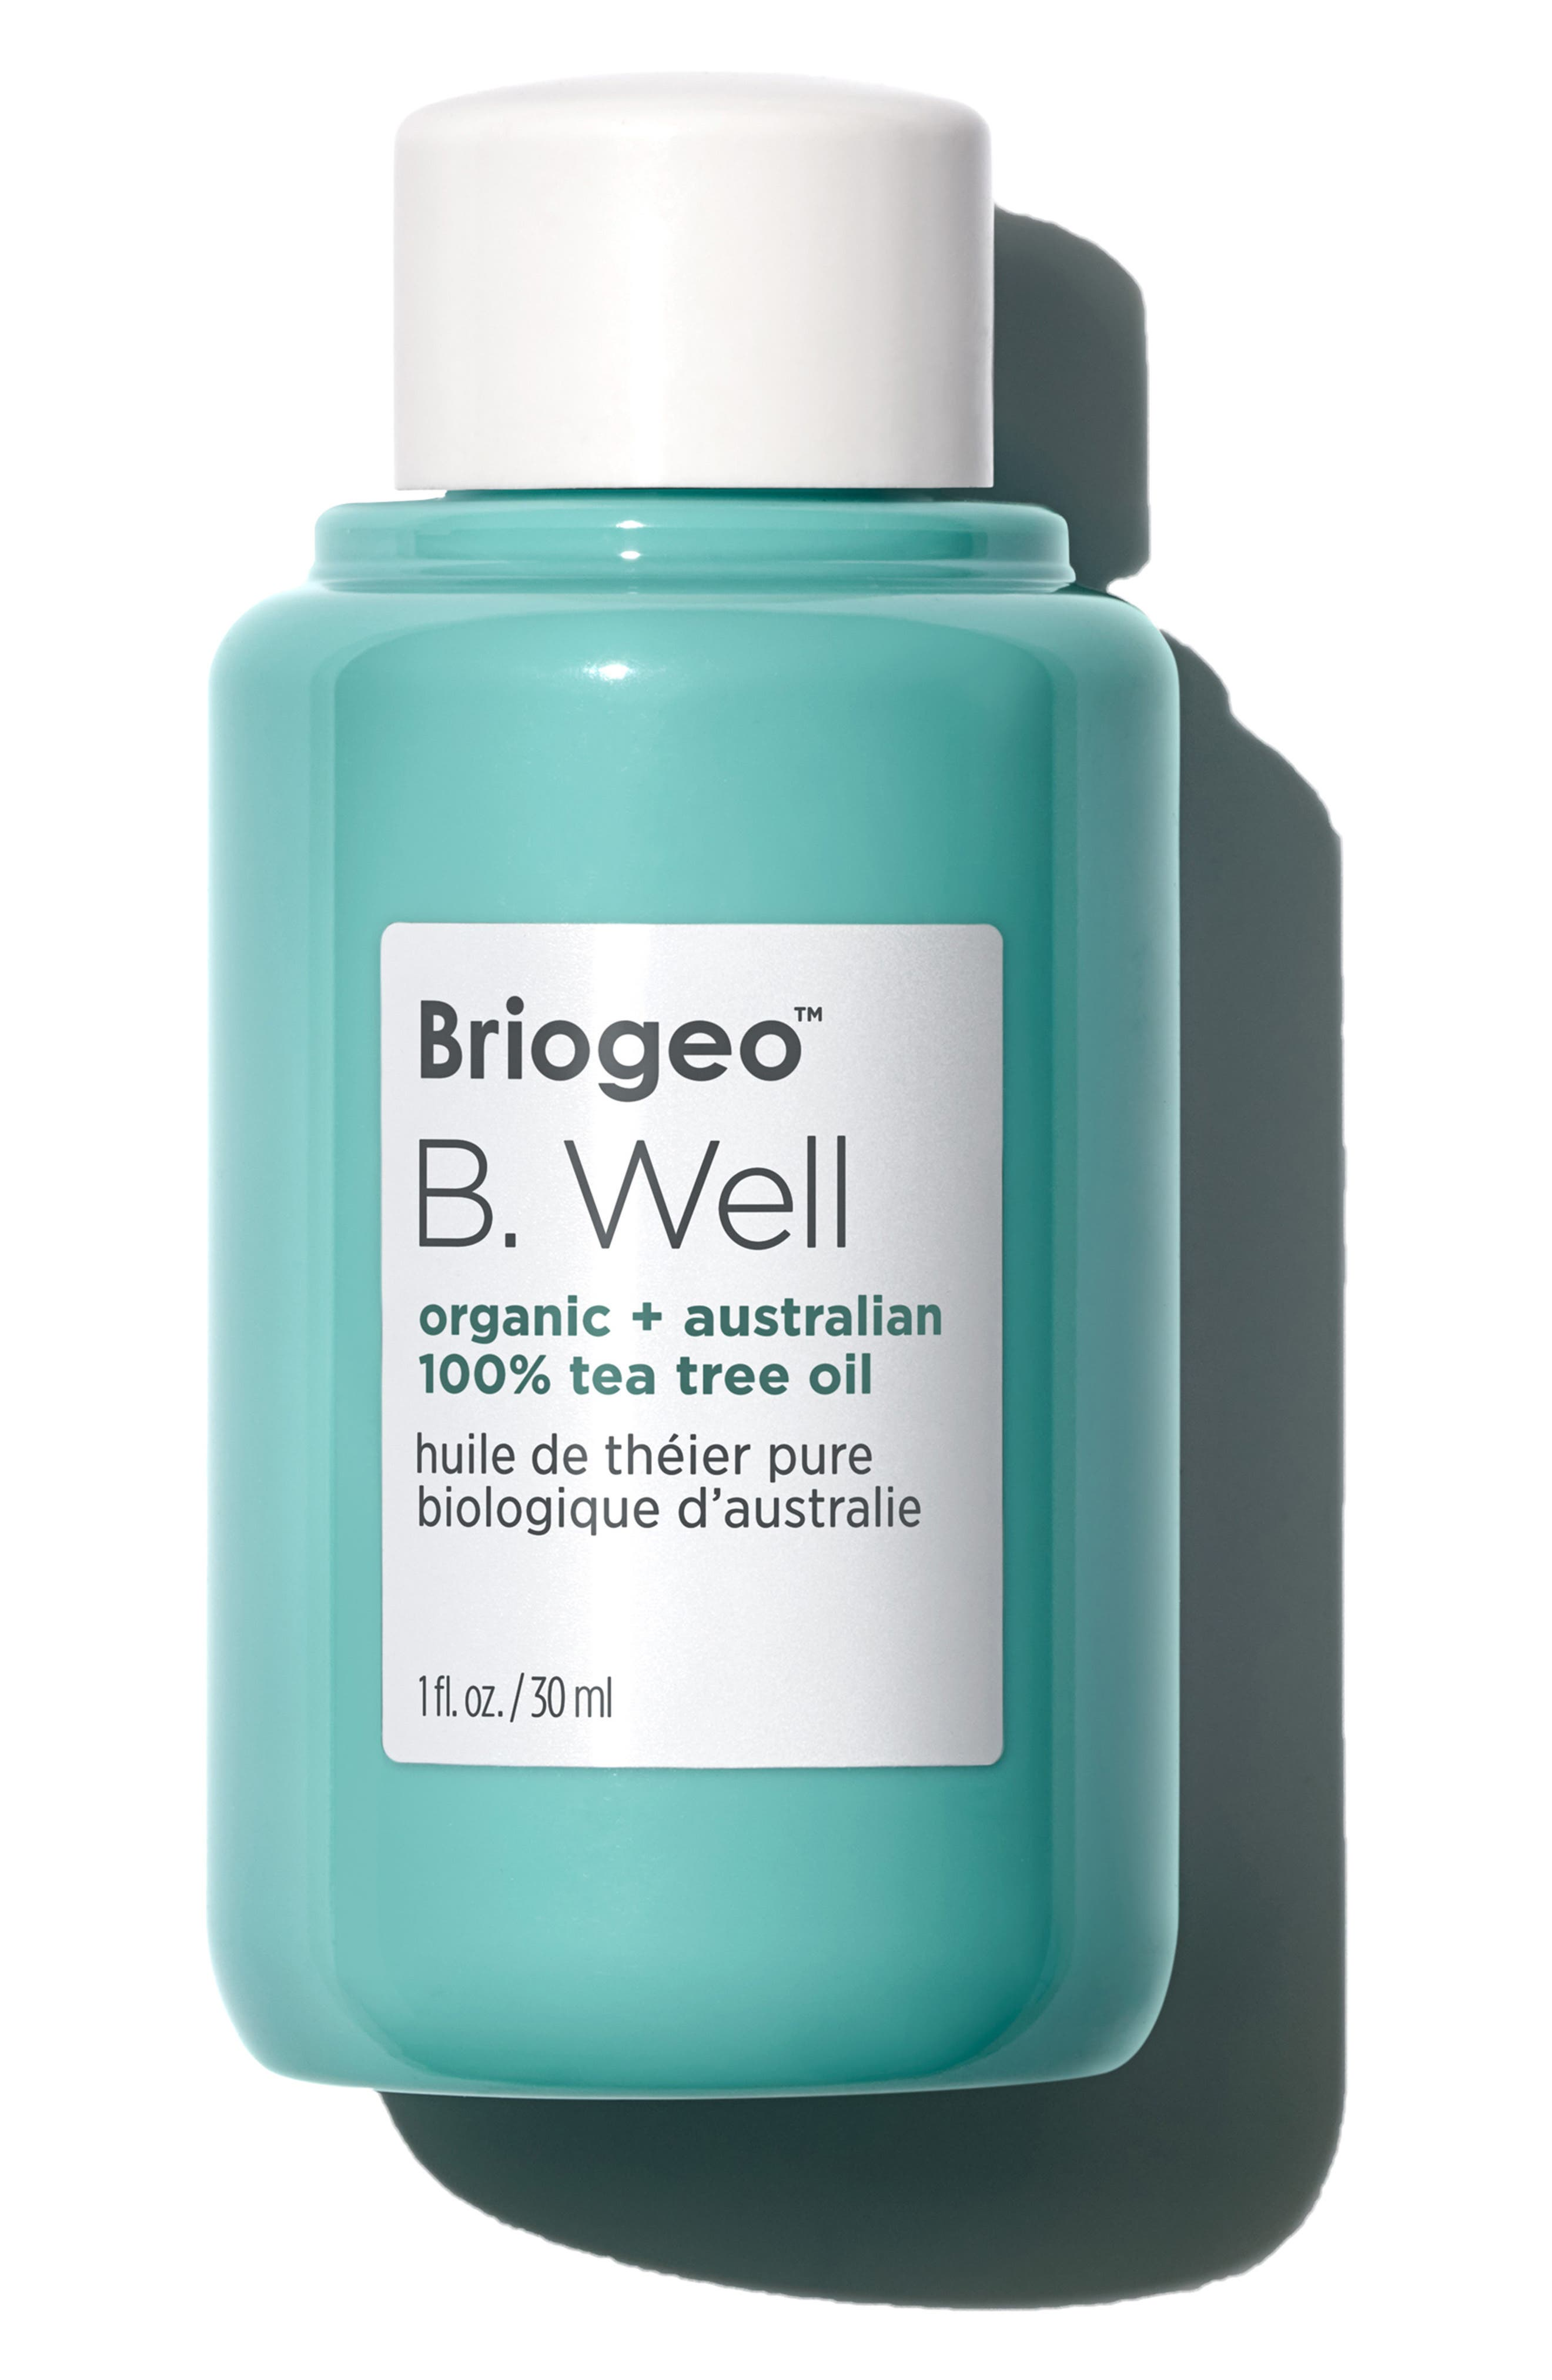 B. Well Organic + Australian 100% Tea Tree Oil